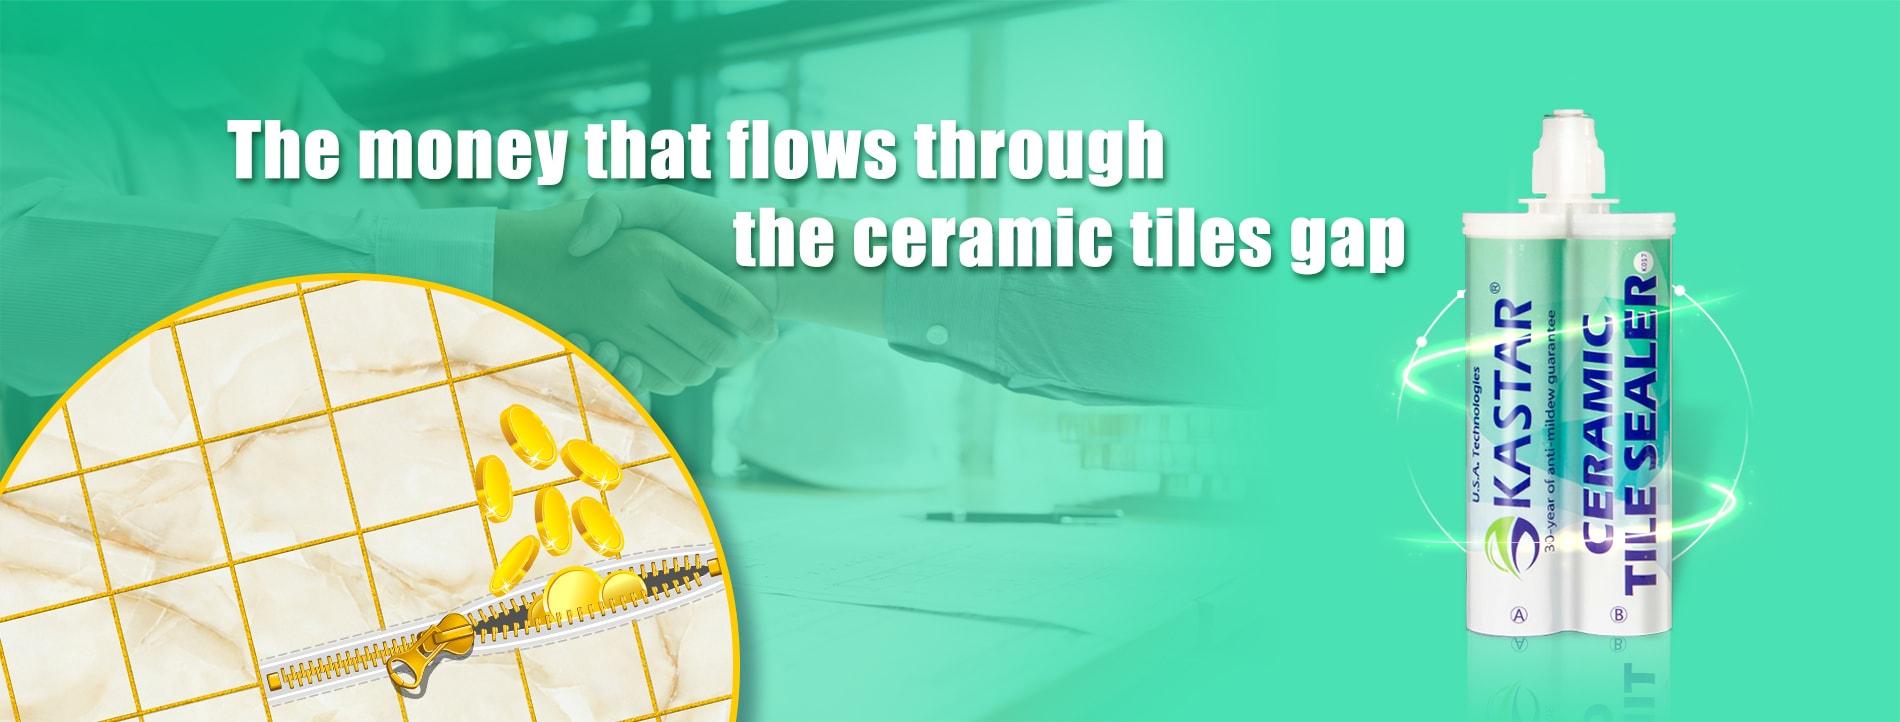 The money that flows through the ceramic tiles gap